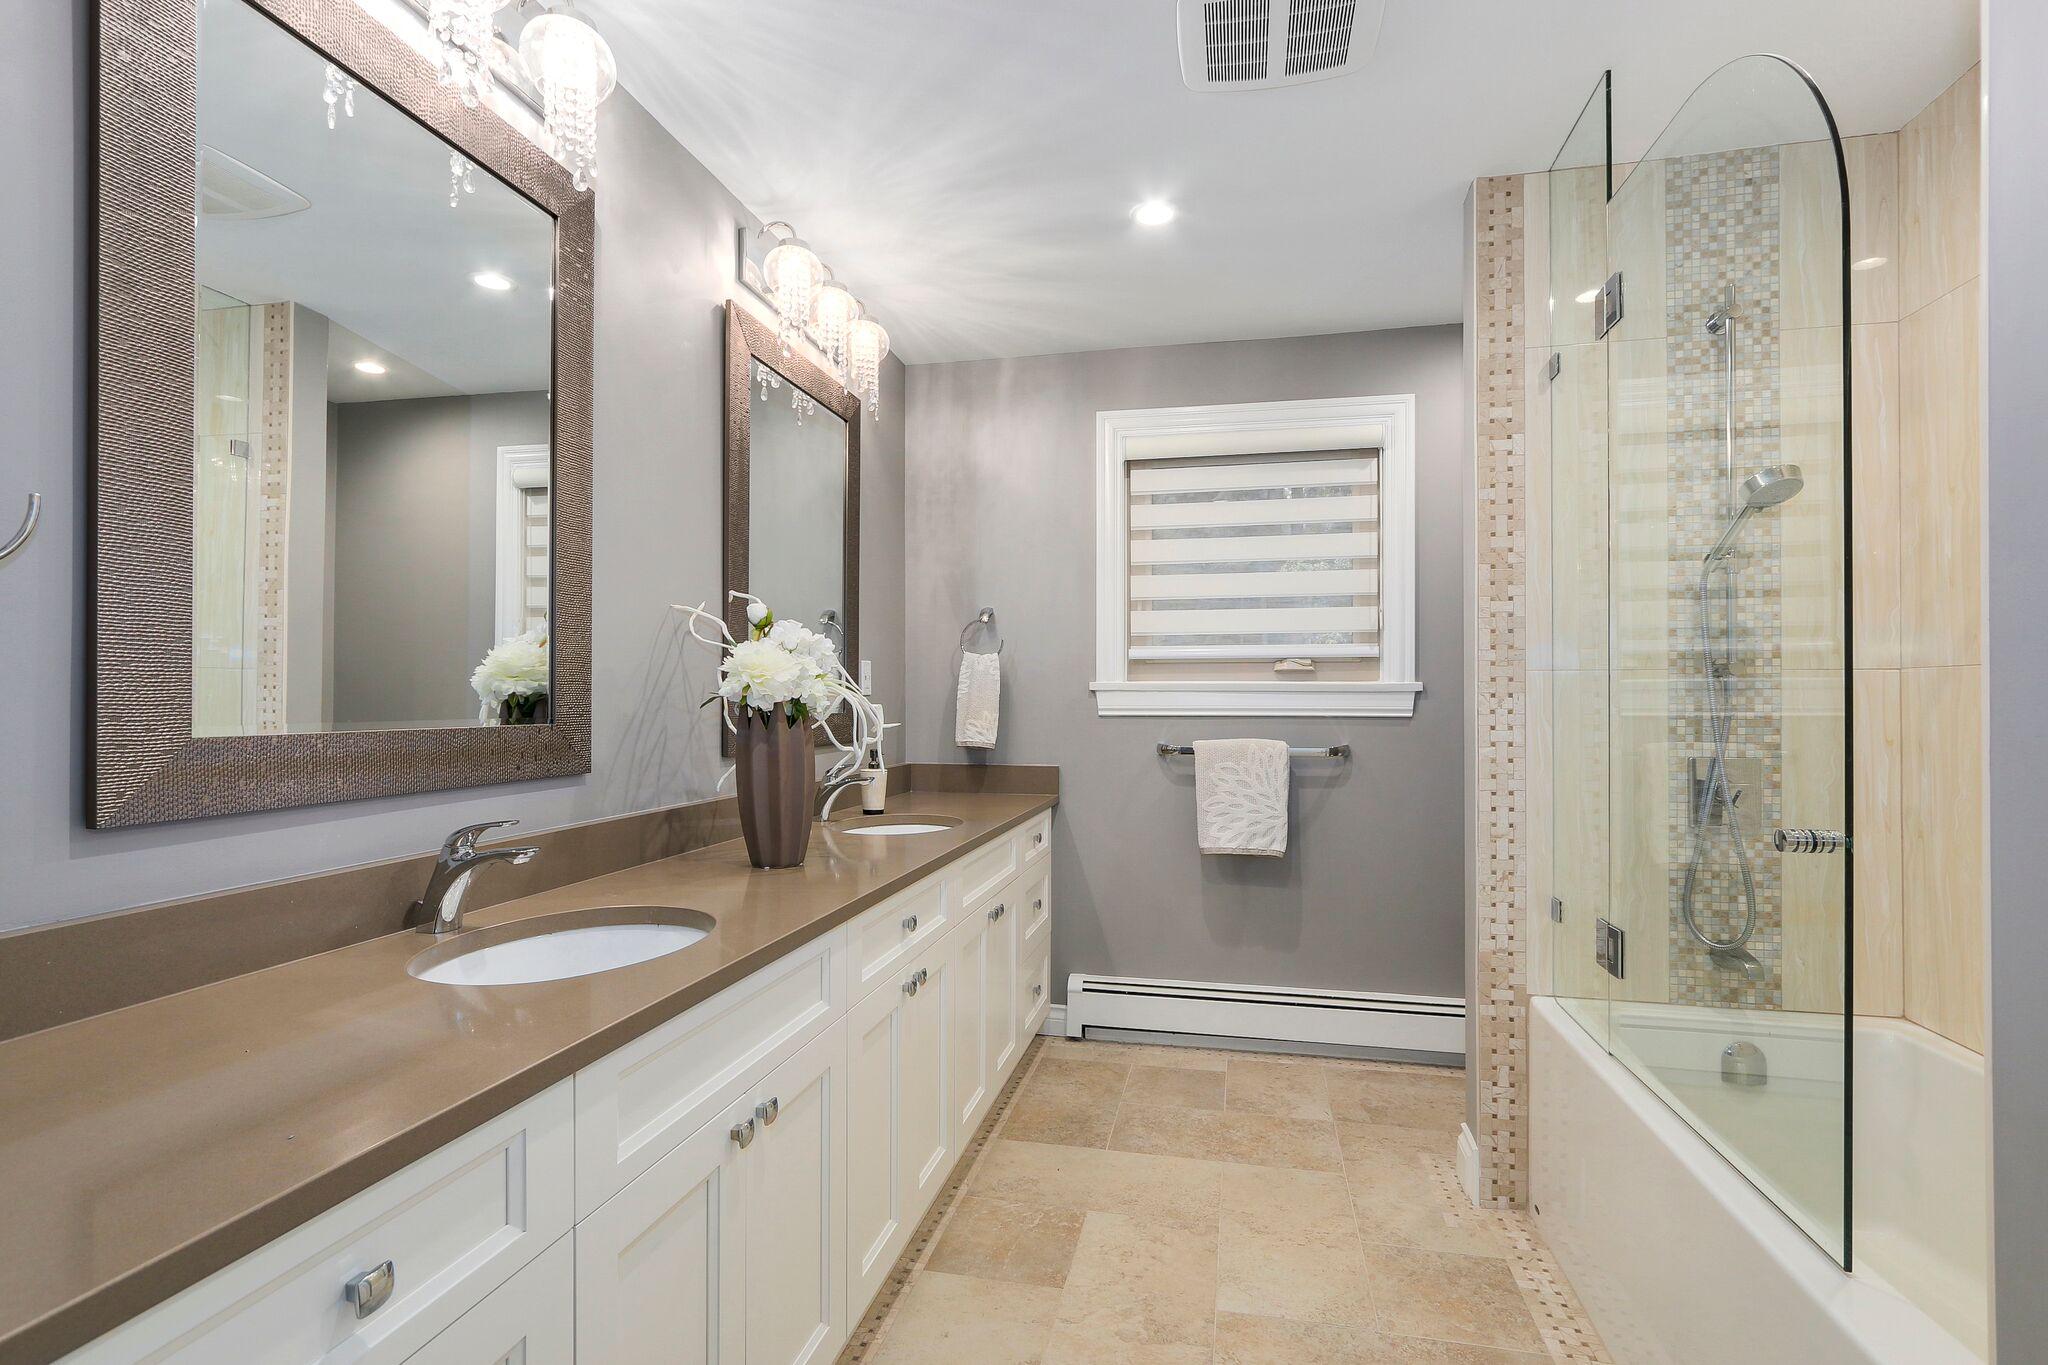 Luxury Bathroom Renovation in Coquitlam